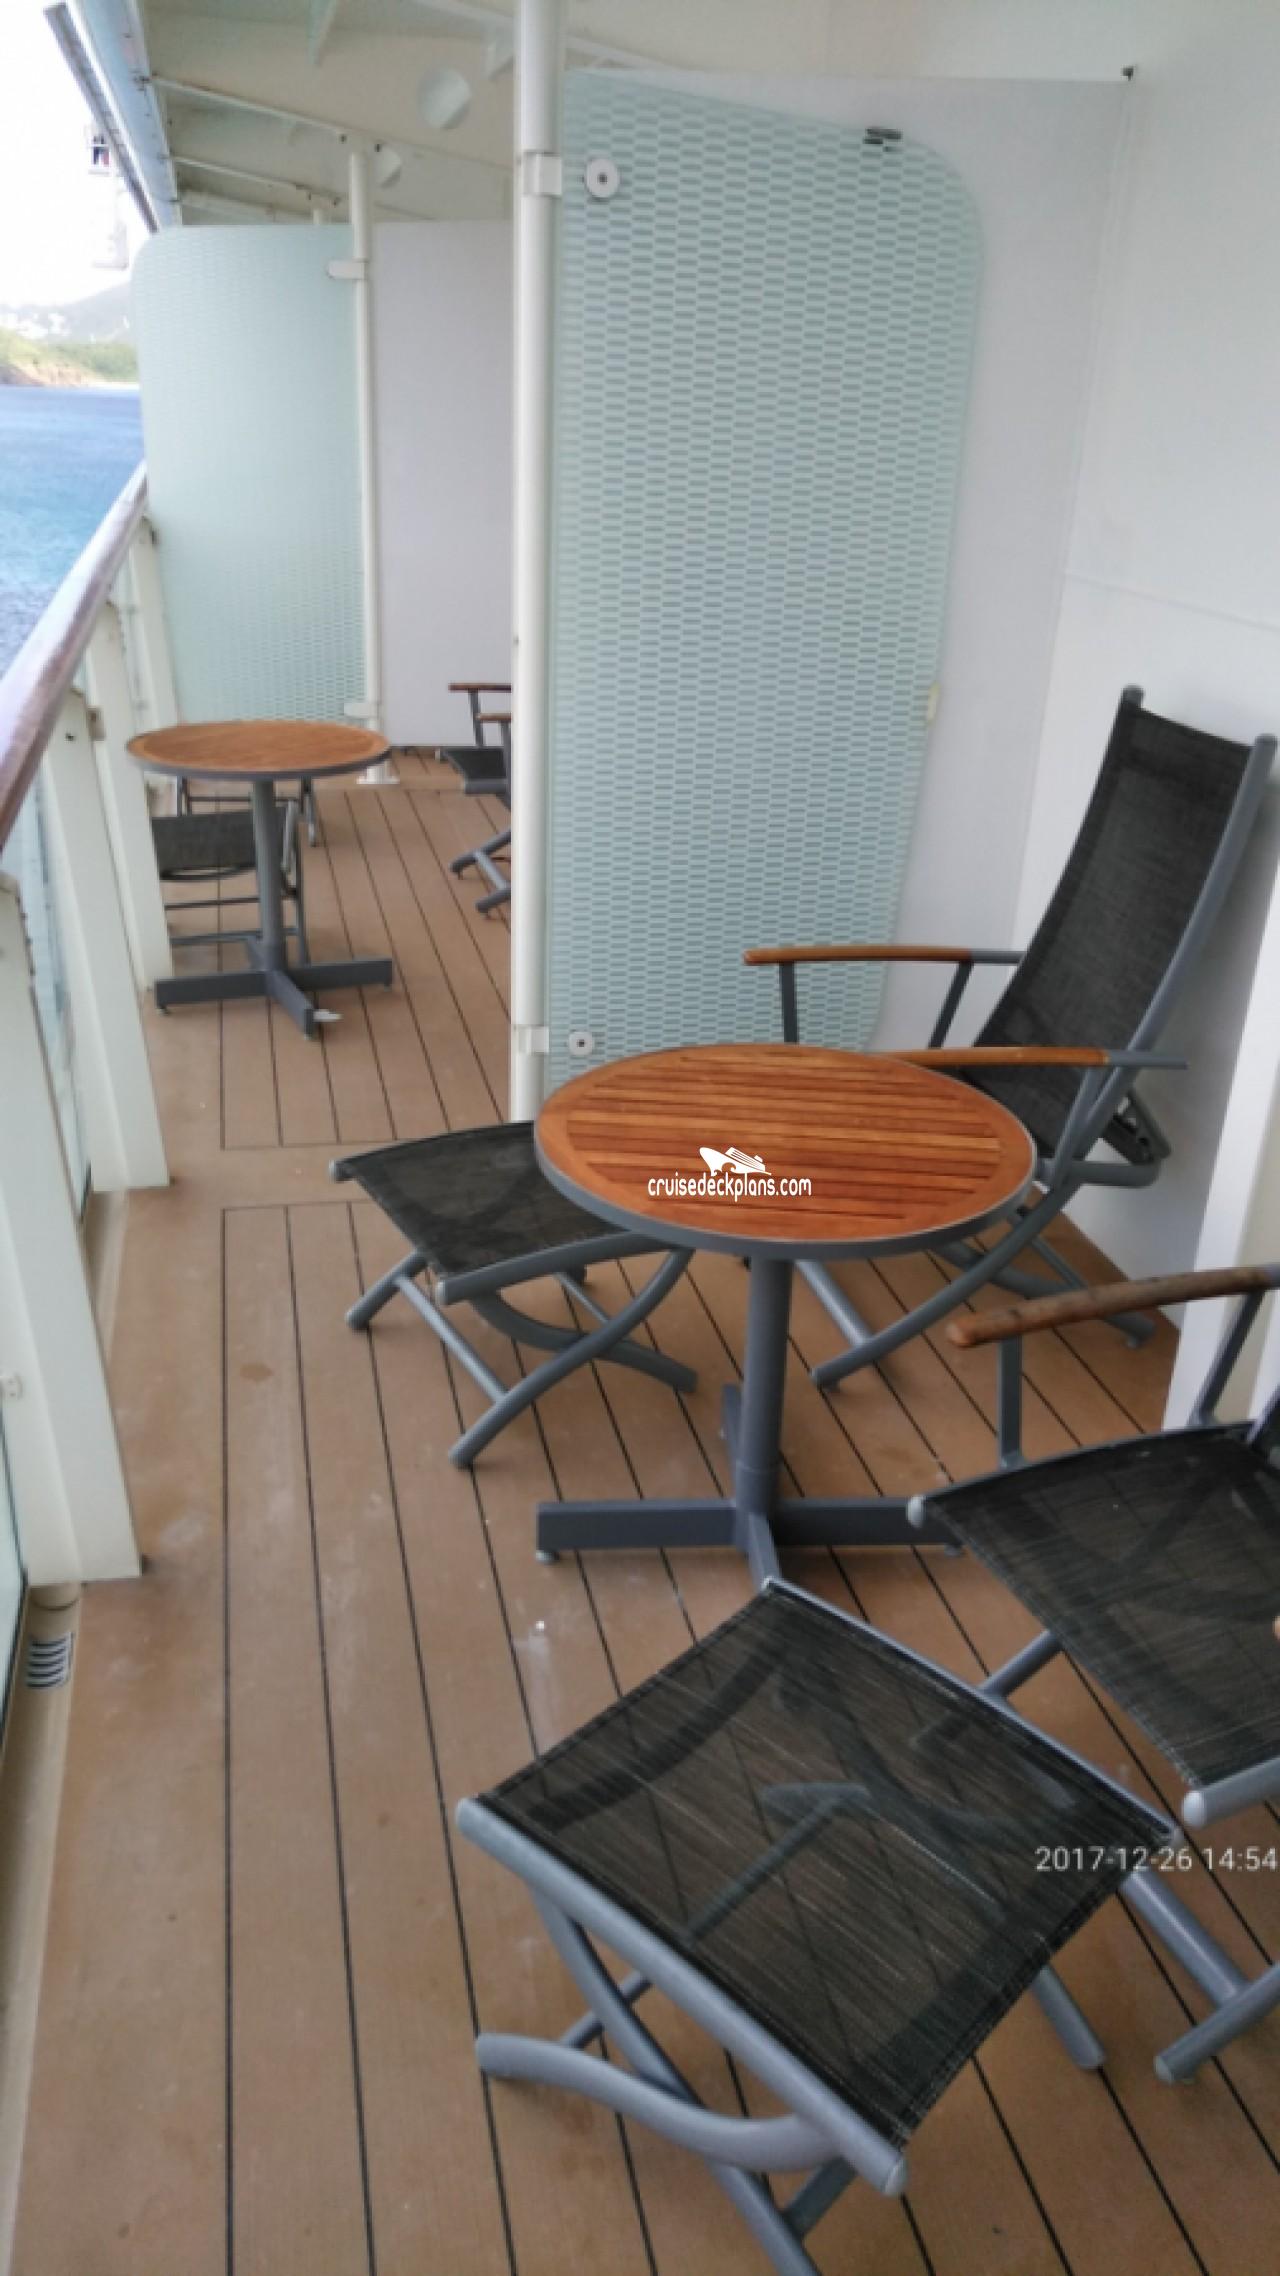 celebrity equinox deck plan pdf